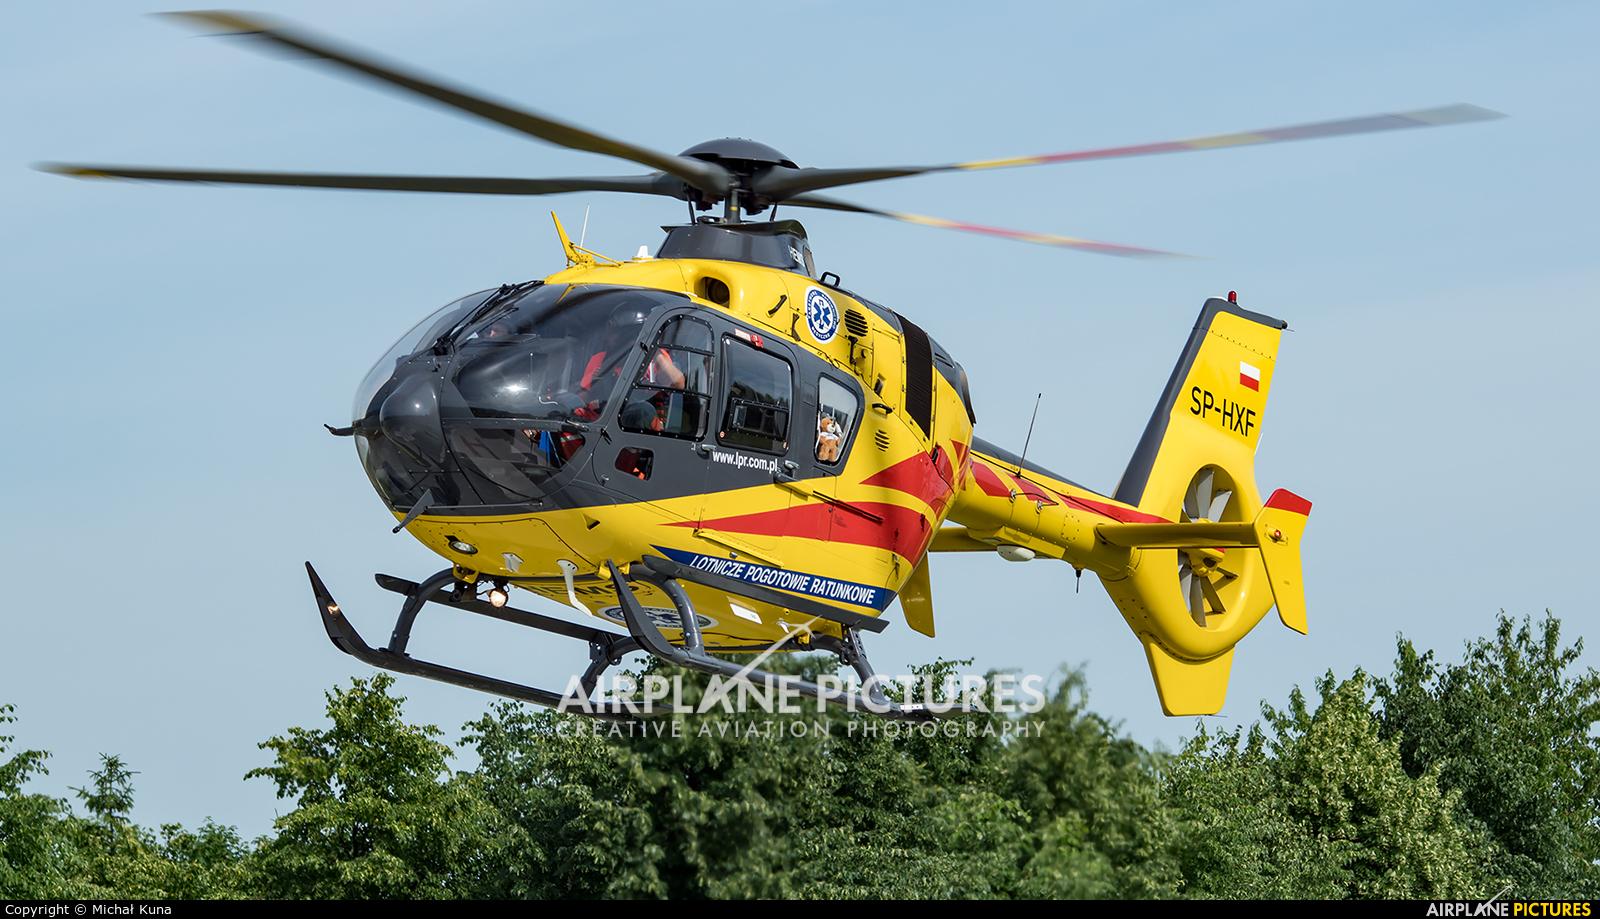 Polish Medical Air Rescue - Lotnicze Pogotowie Ratunkowe SP-HXF aircraft at Elbląg